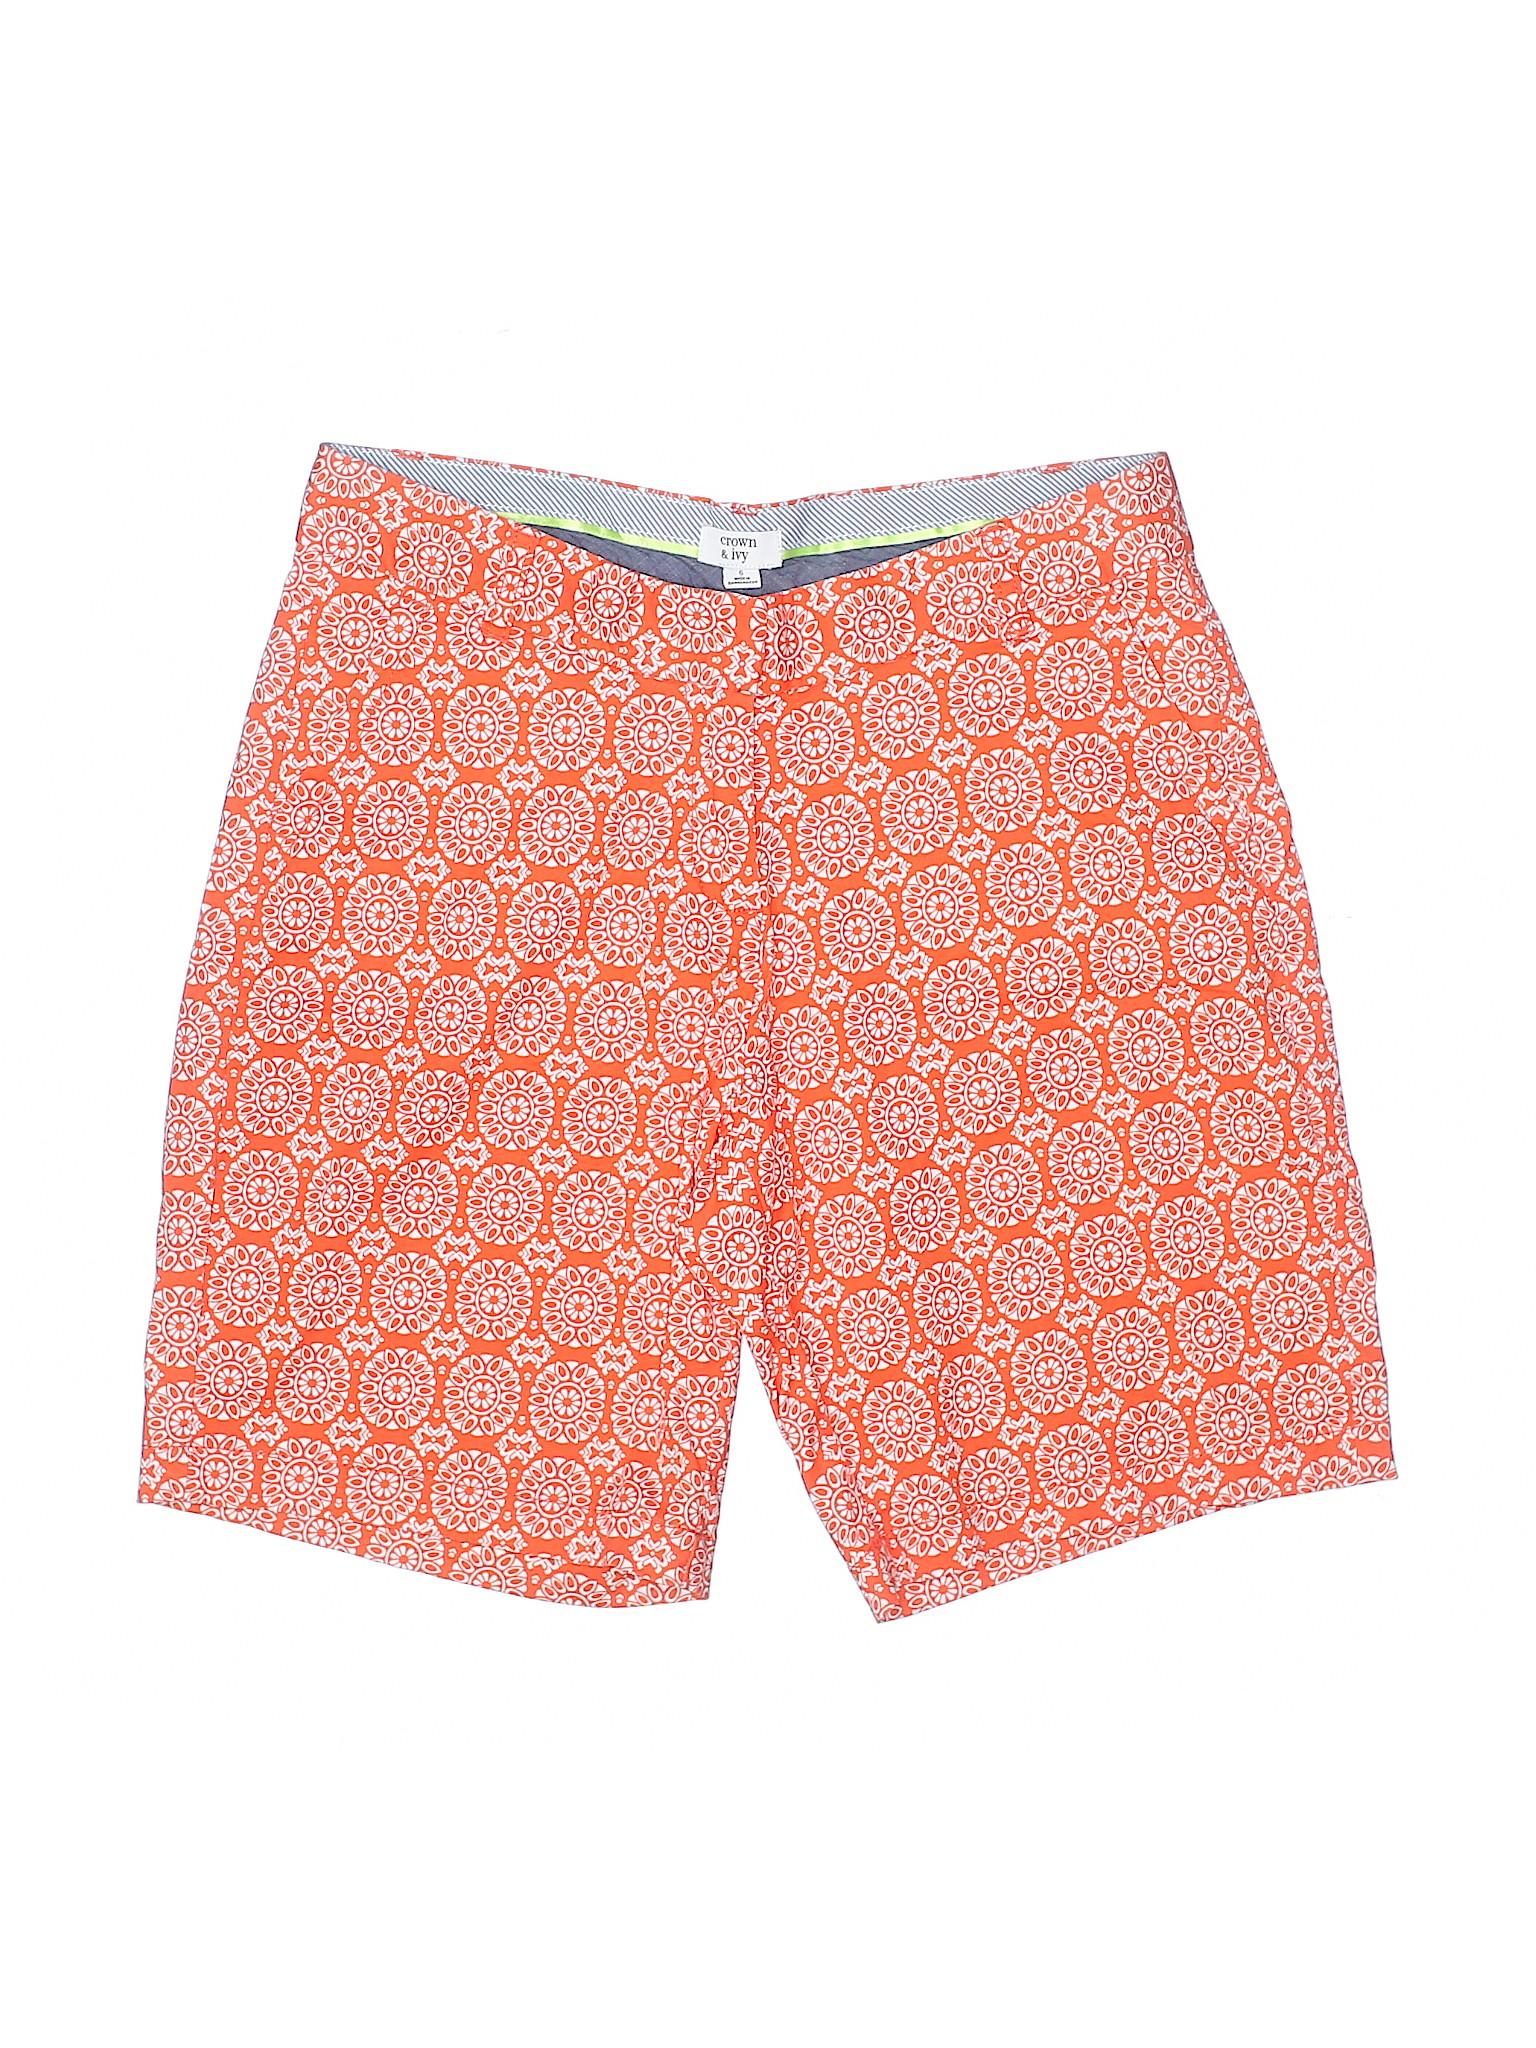 Crown Khaki Ivy Shorts amp; winter Leisure 1BqxU67A